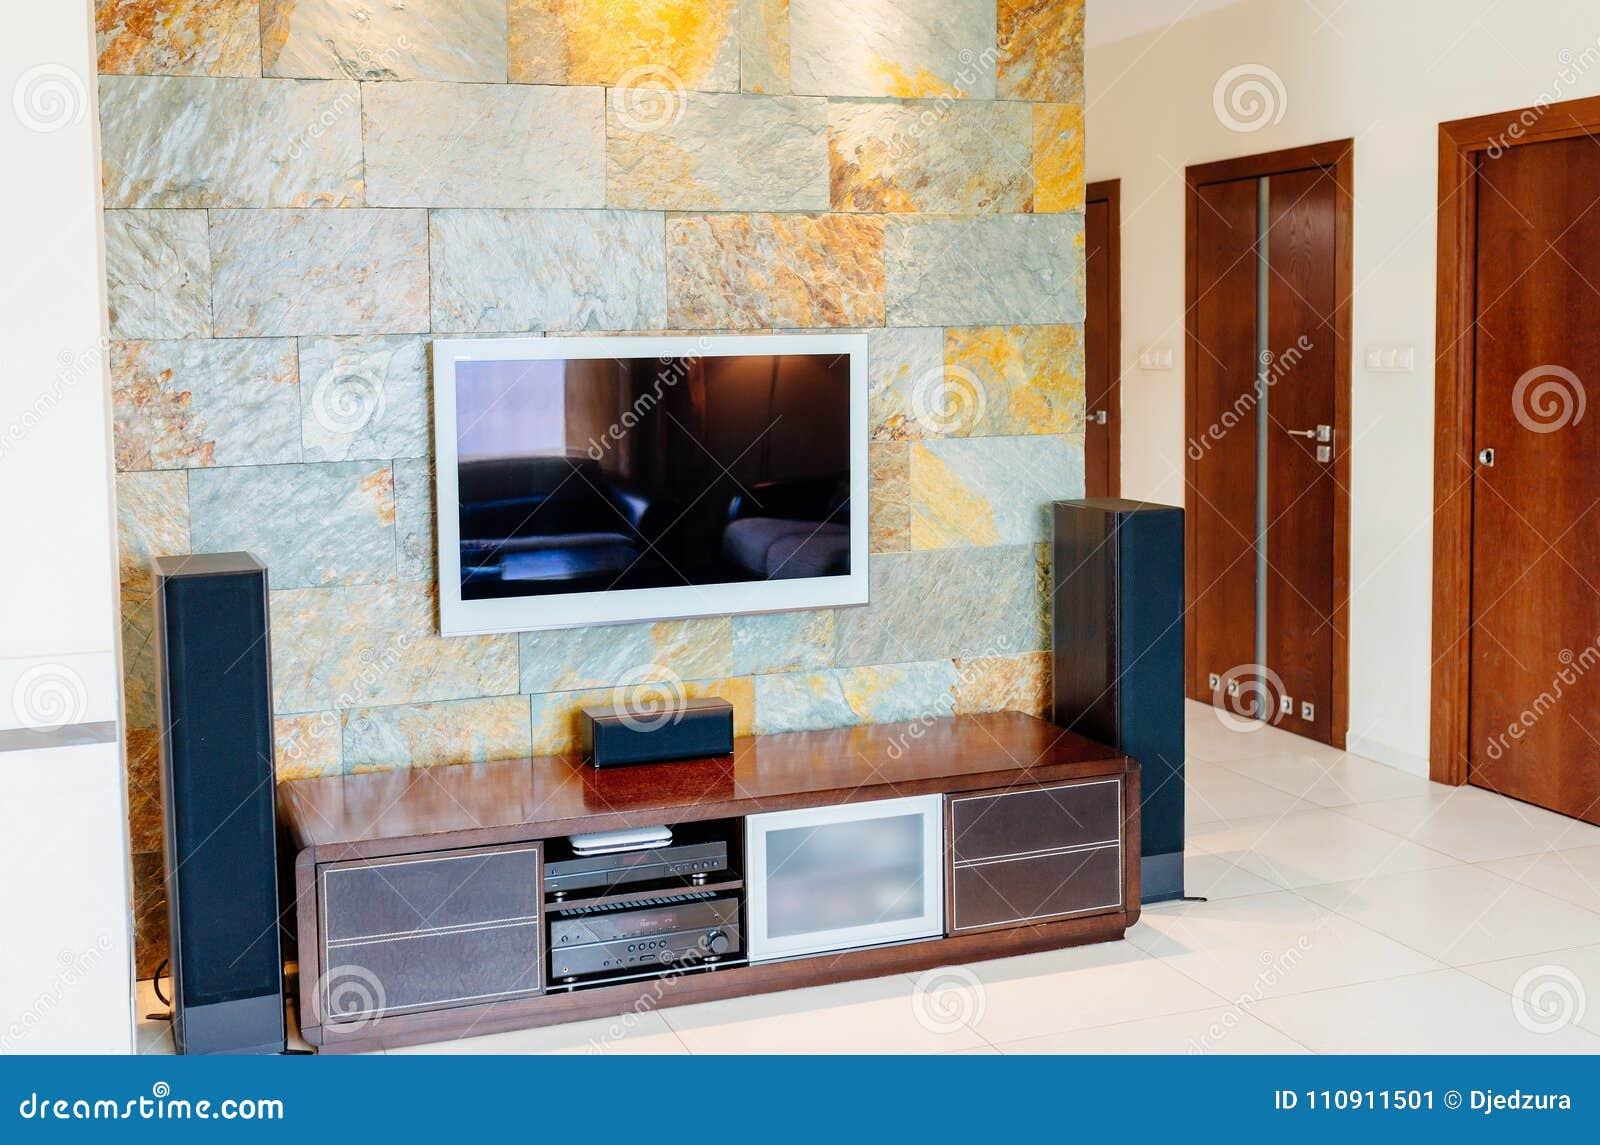 TV set with Hi-fi home cinema system